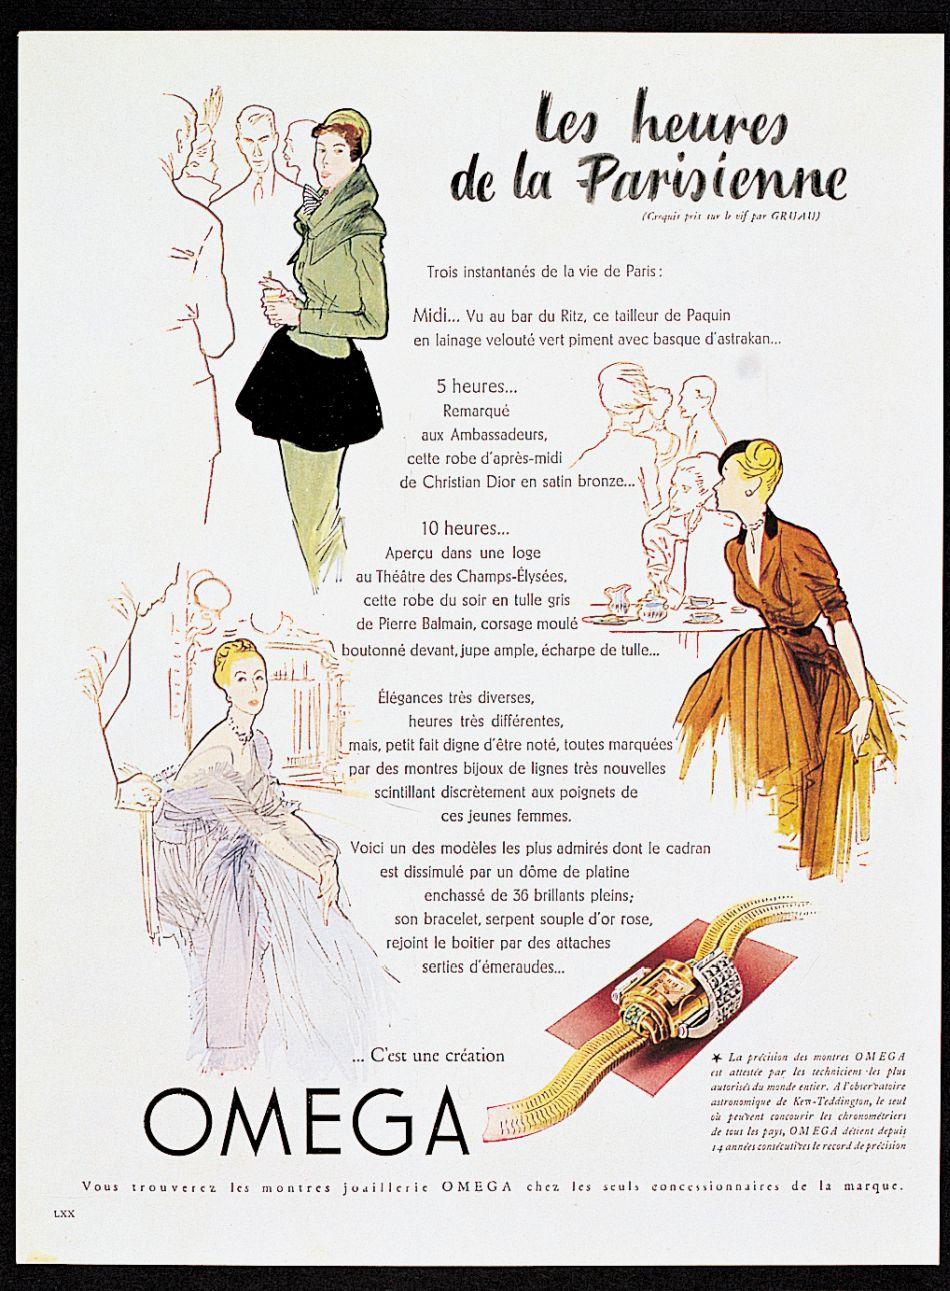 Omega et les femmes : tant la mode que la mesure du temps